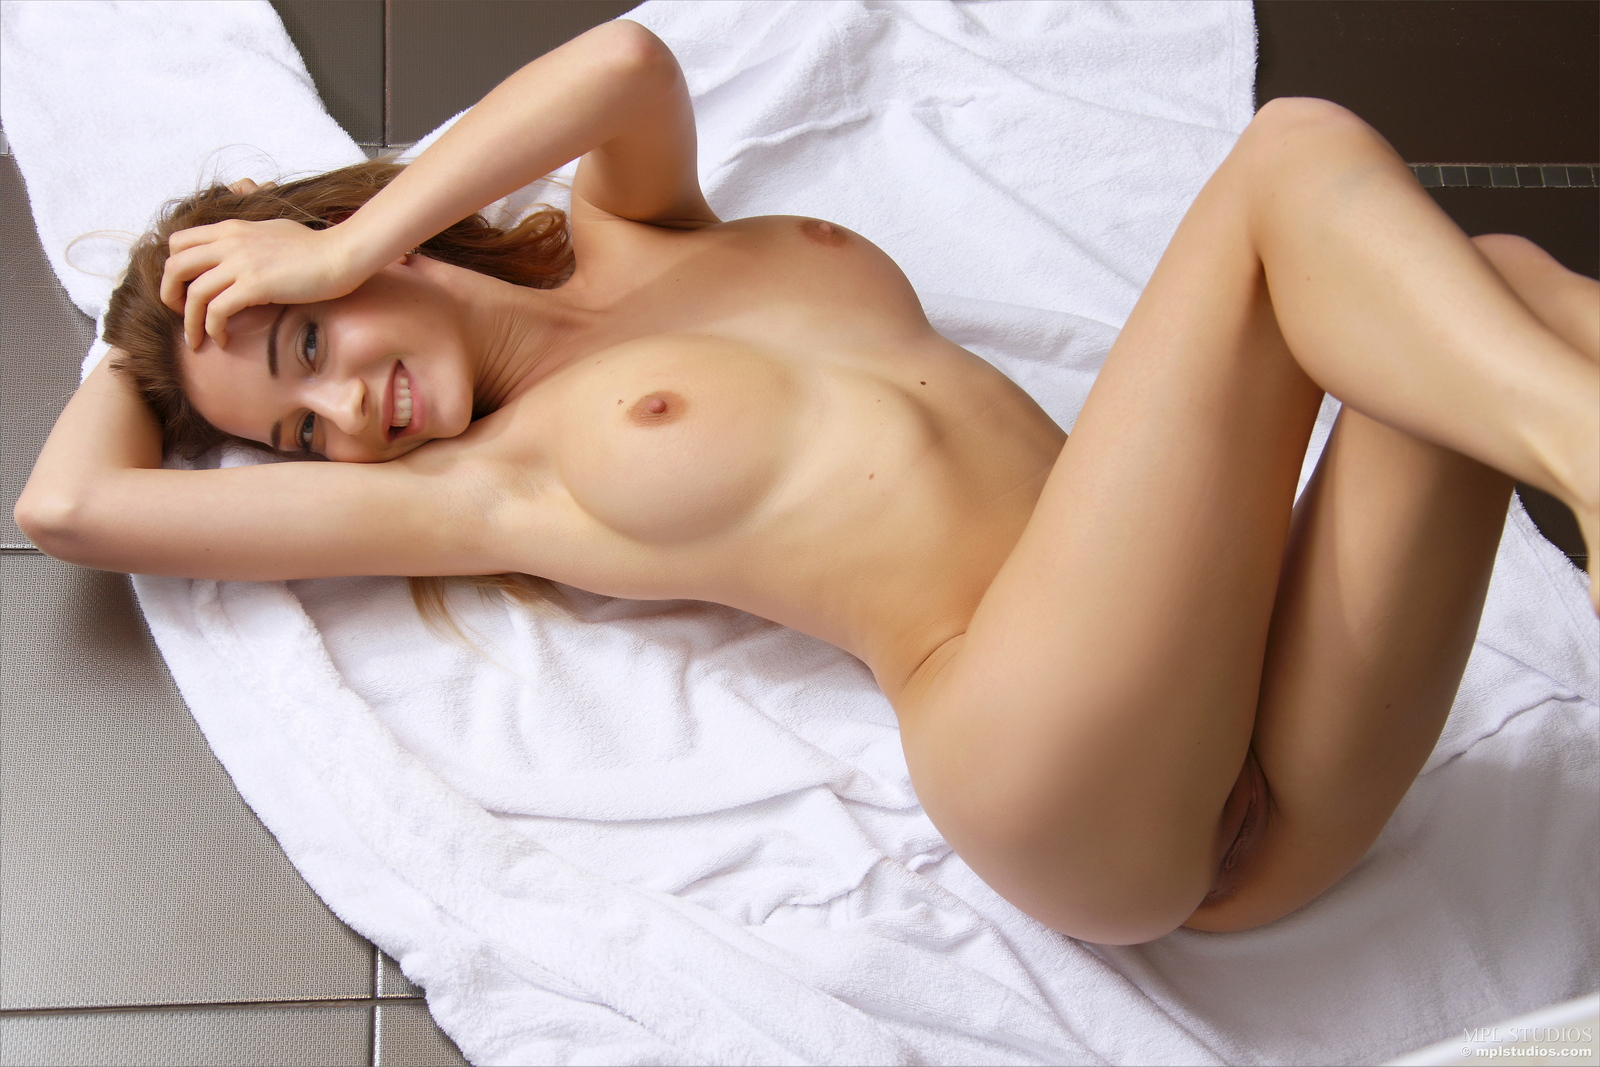 danica-bathroom-blonde-dressing-gown-naked-mplstudios-33